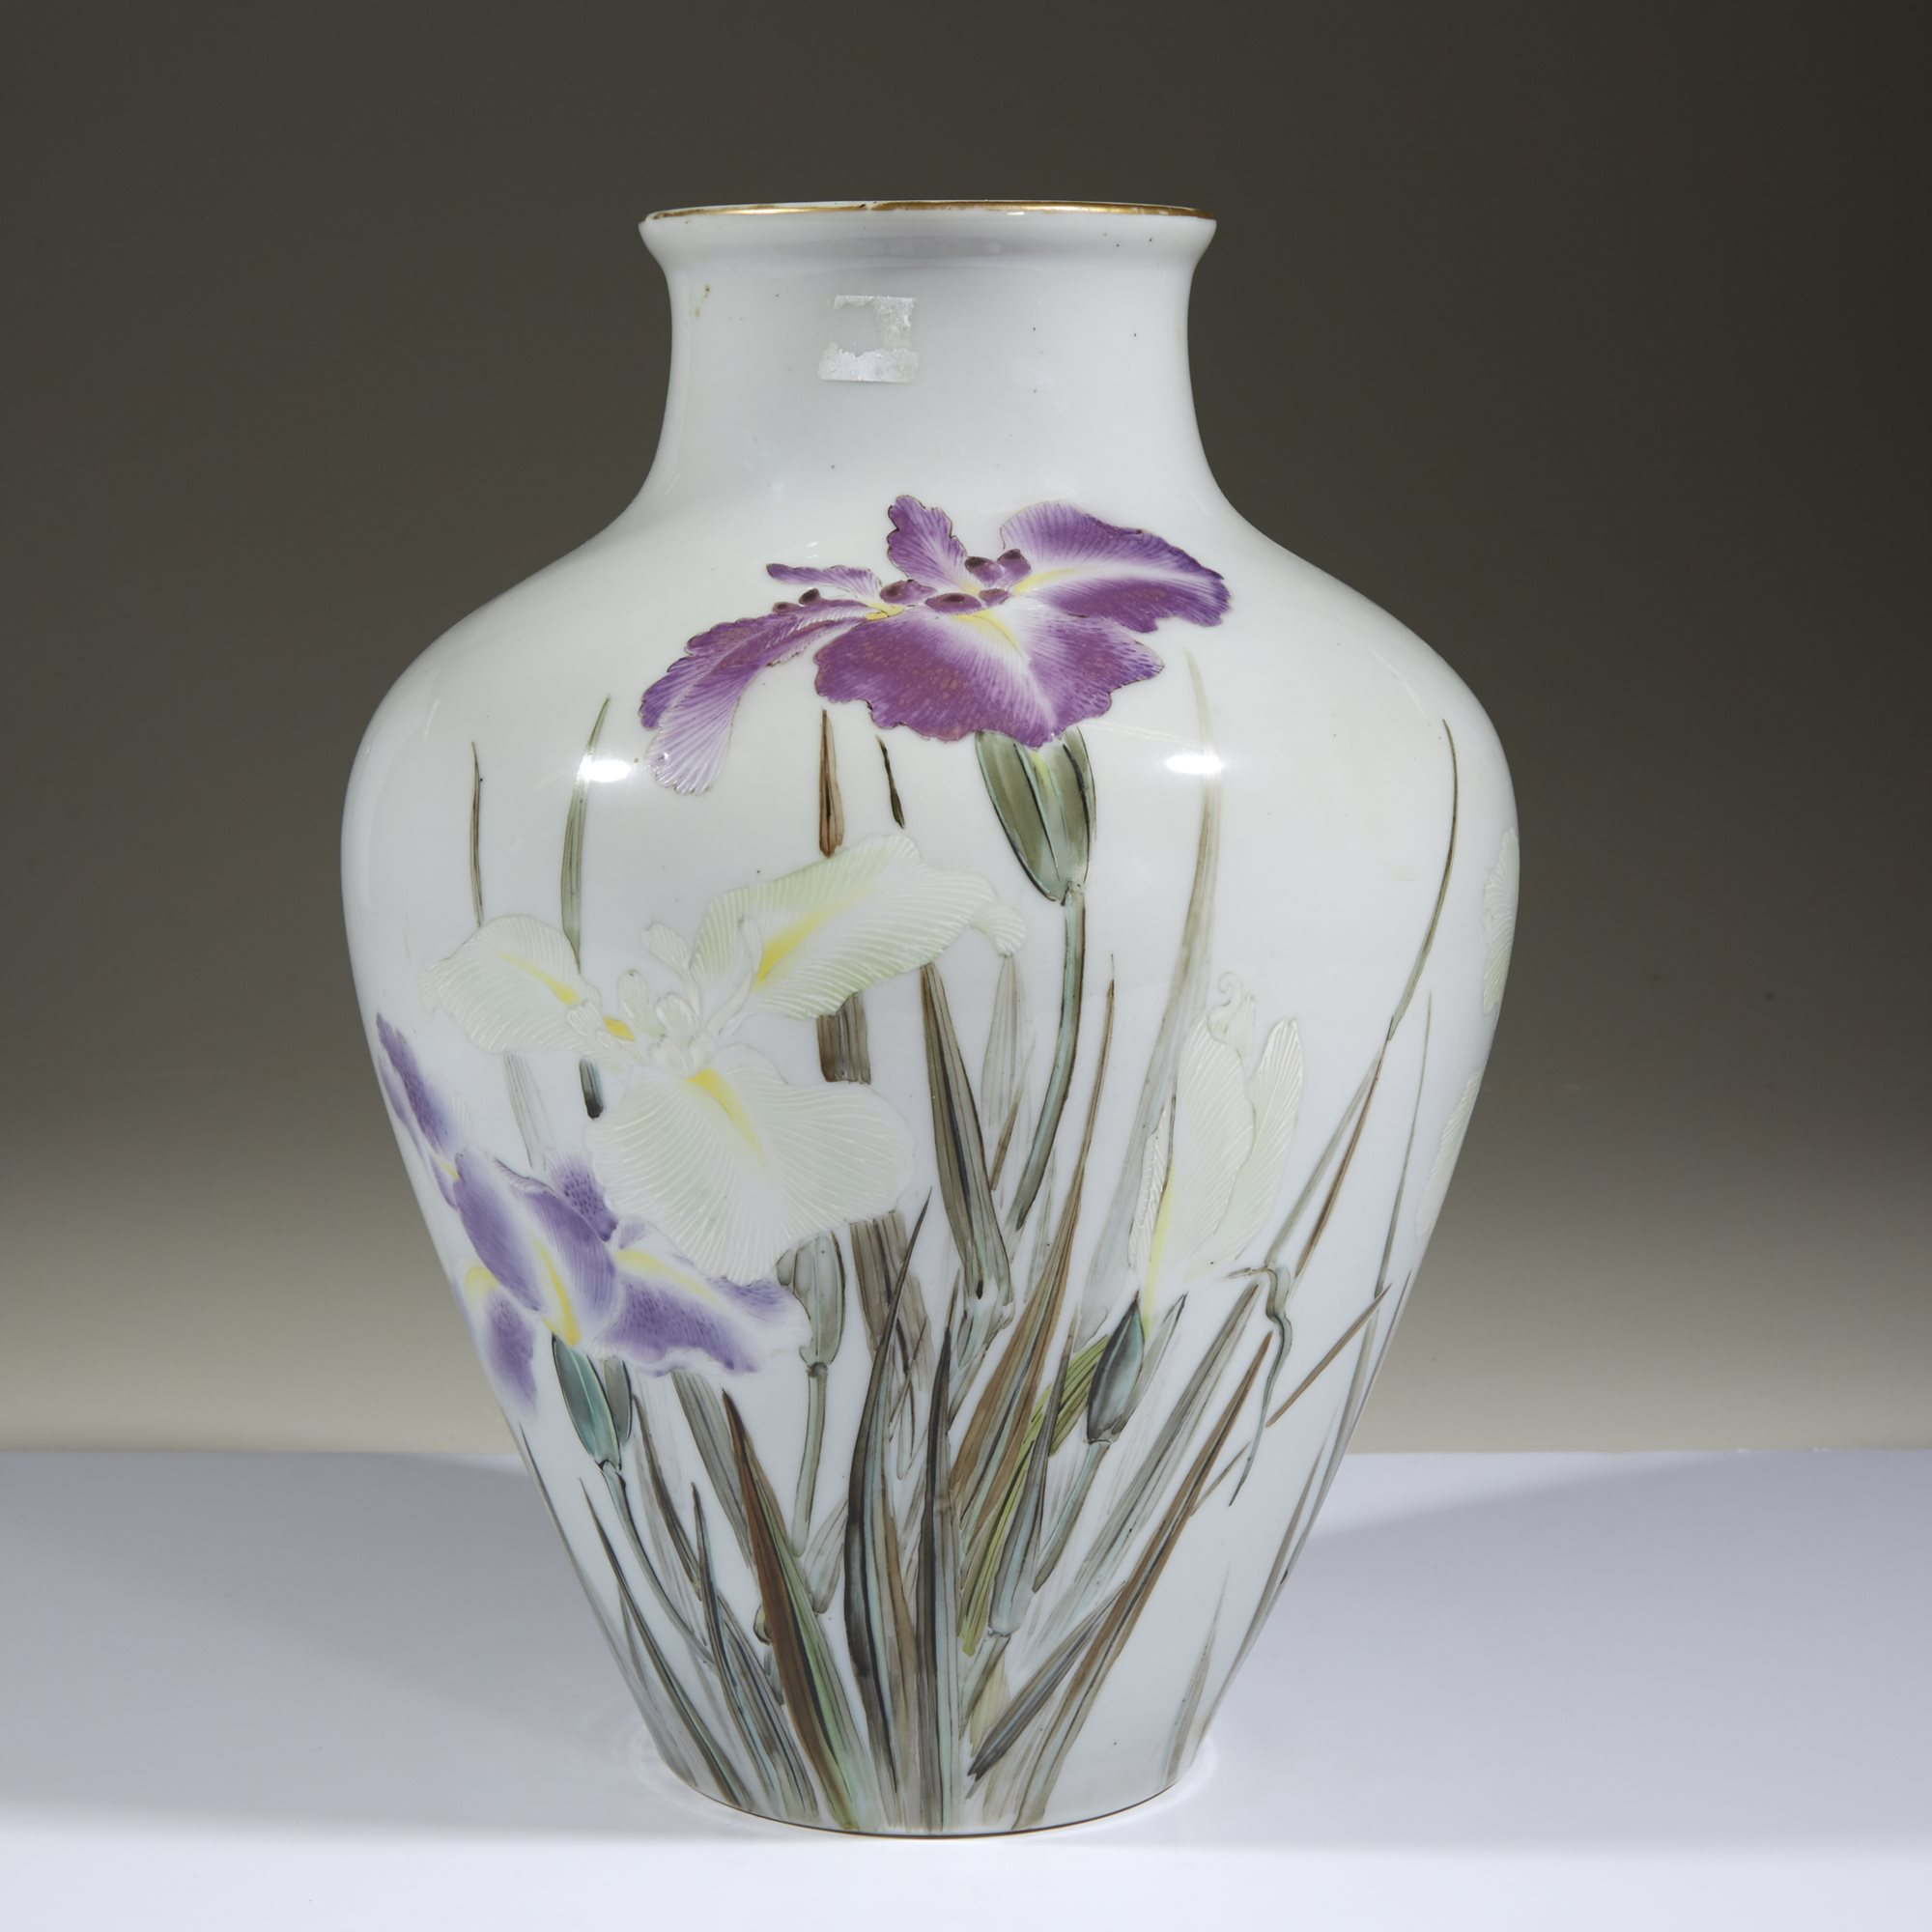 Lot 196 | A Japanese porcelain